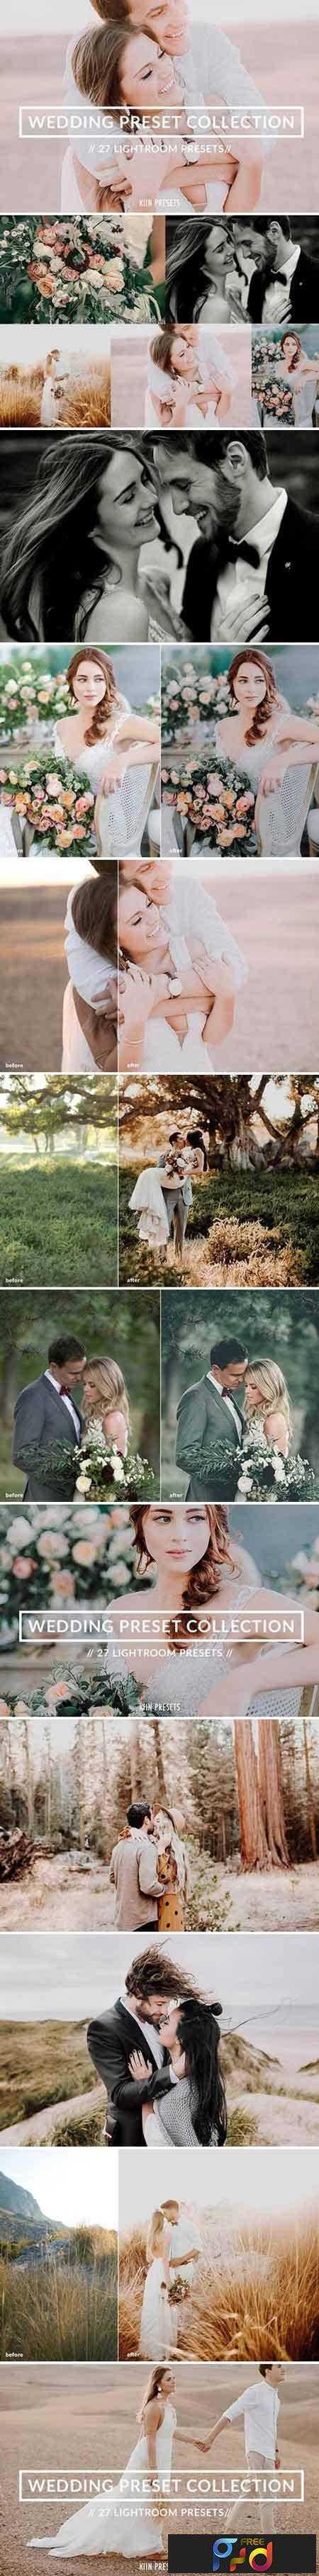 1804245 WEDDING LIGHTROOM PRESET COLLECTION 2358289 1